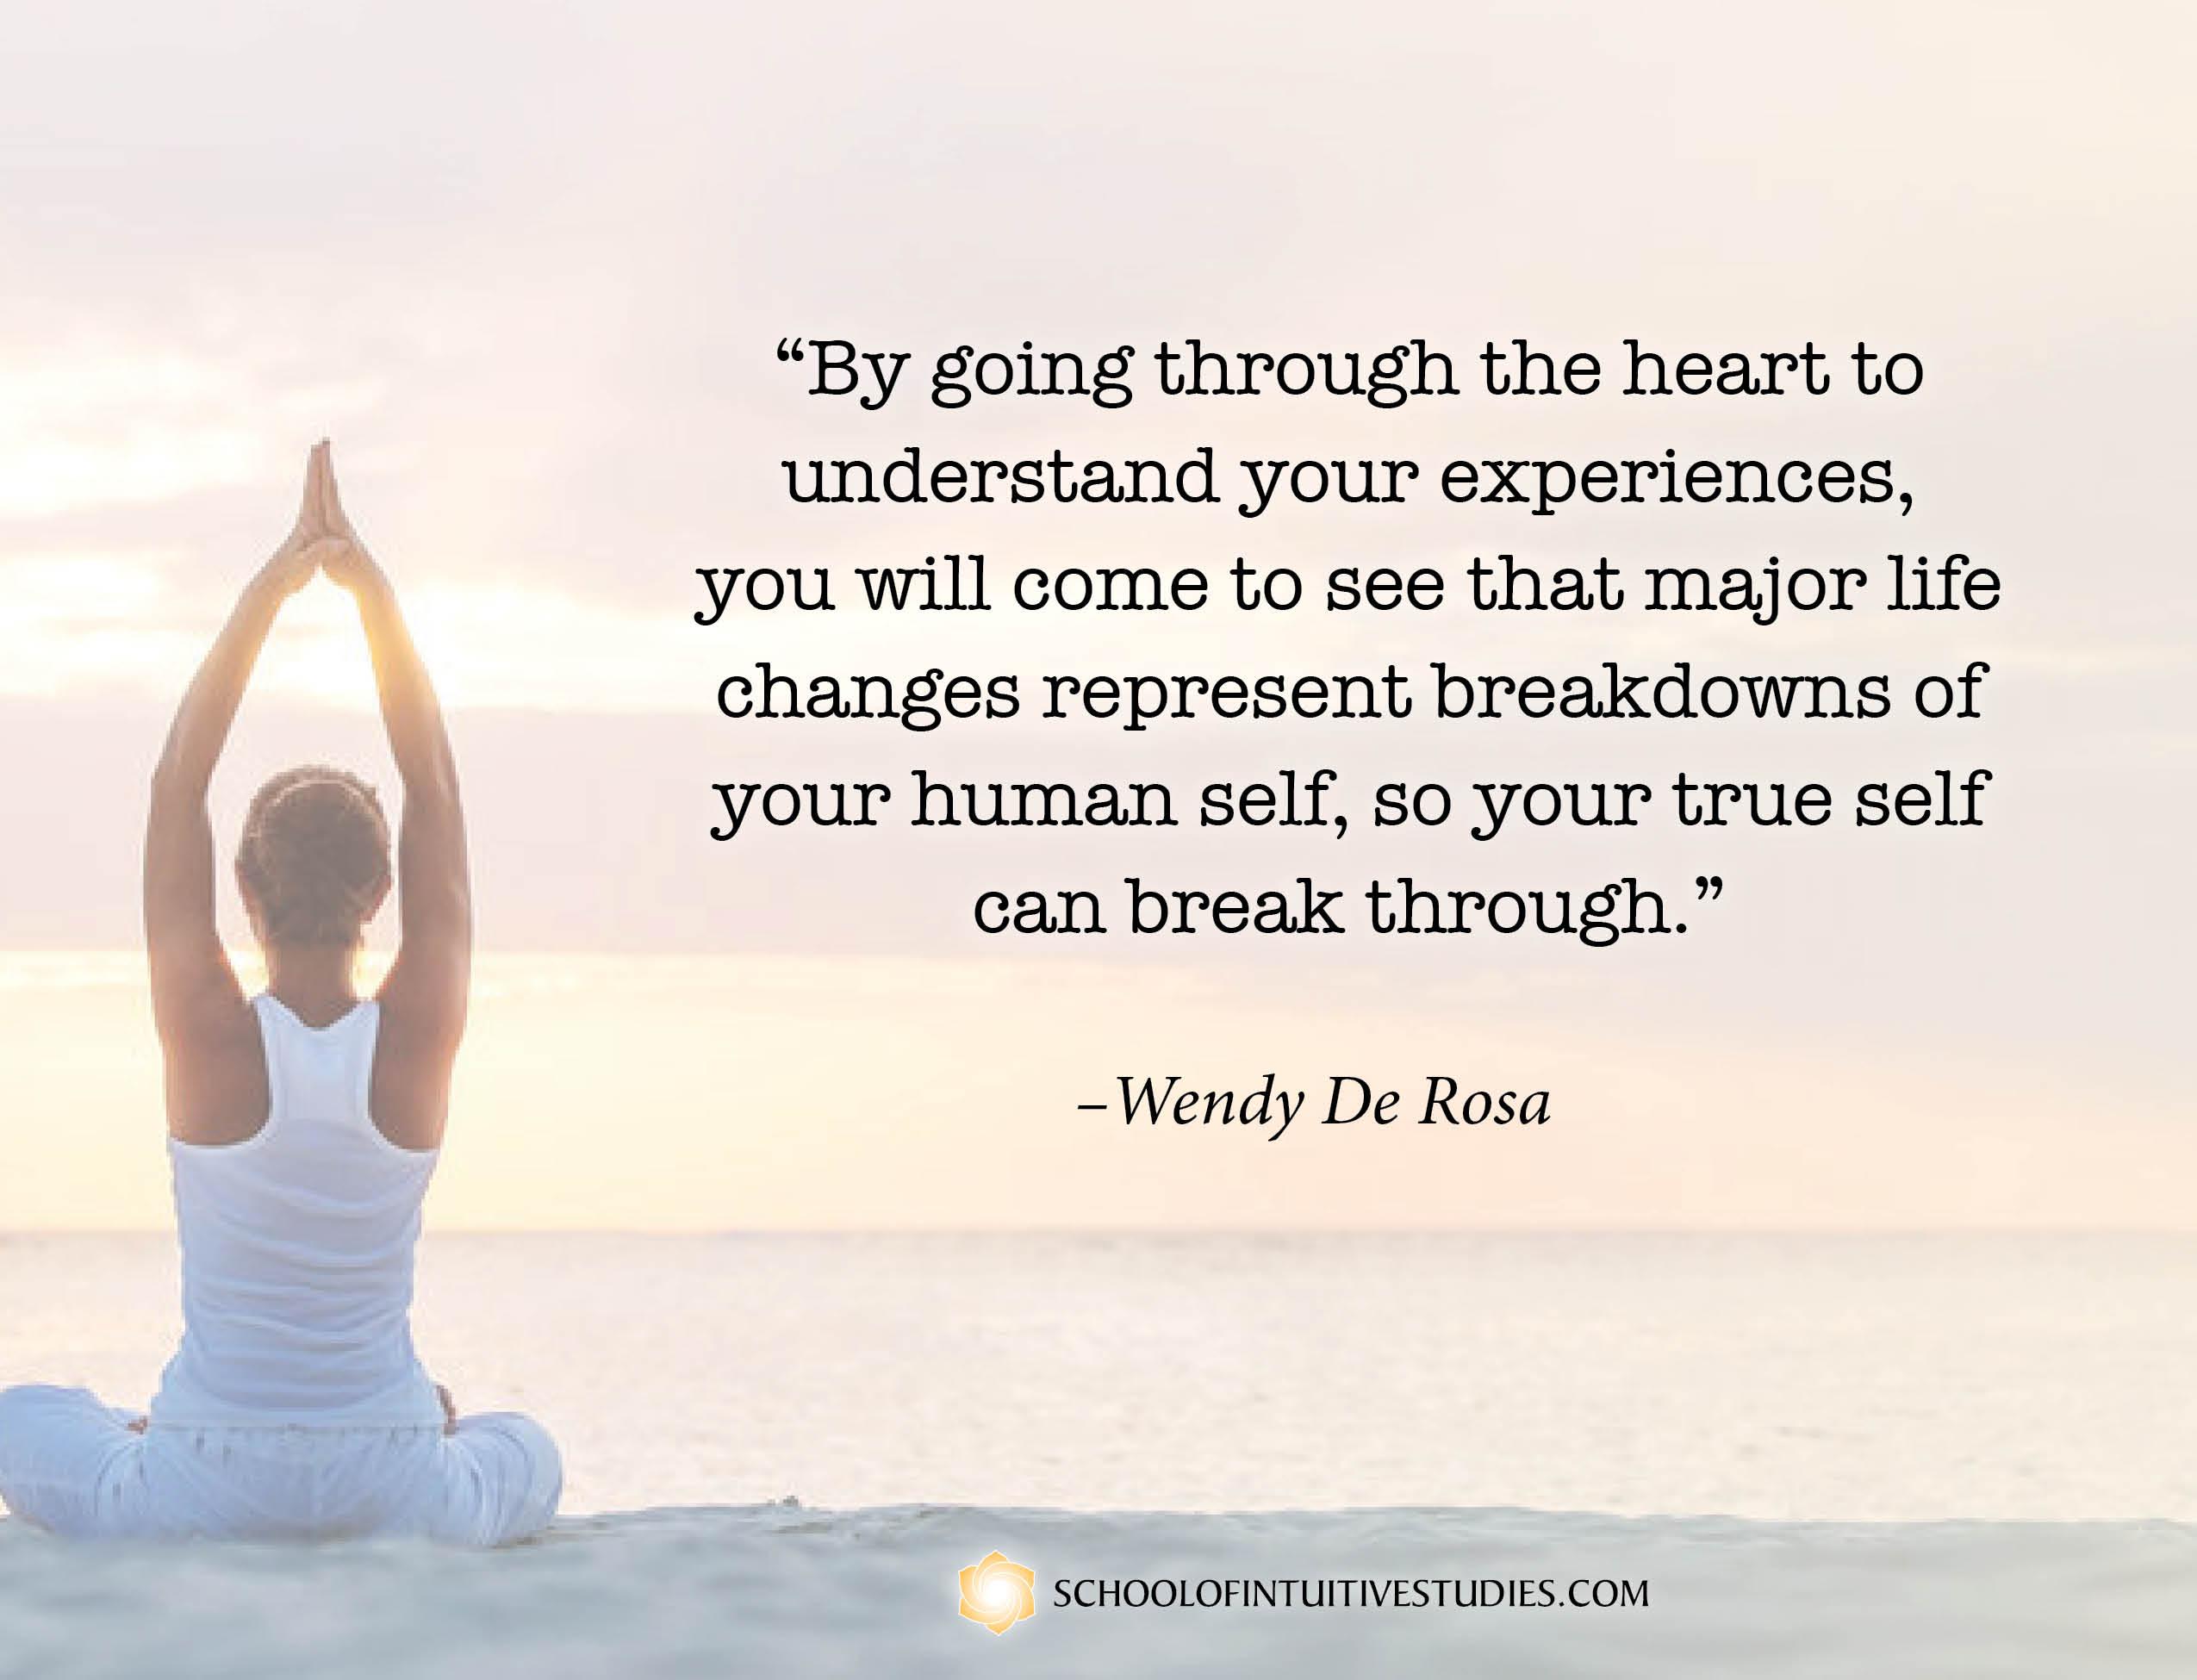 Wendy De Rosa quote